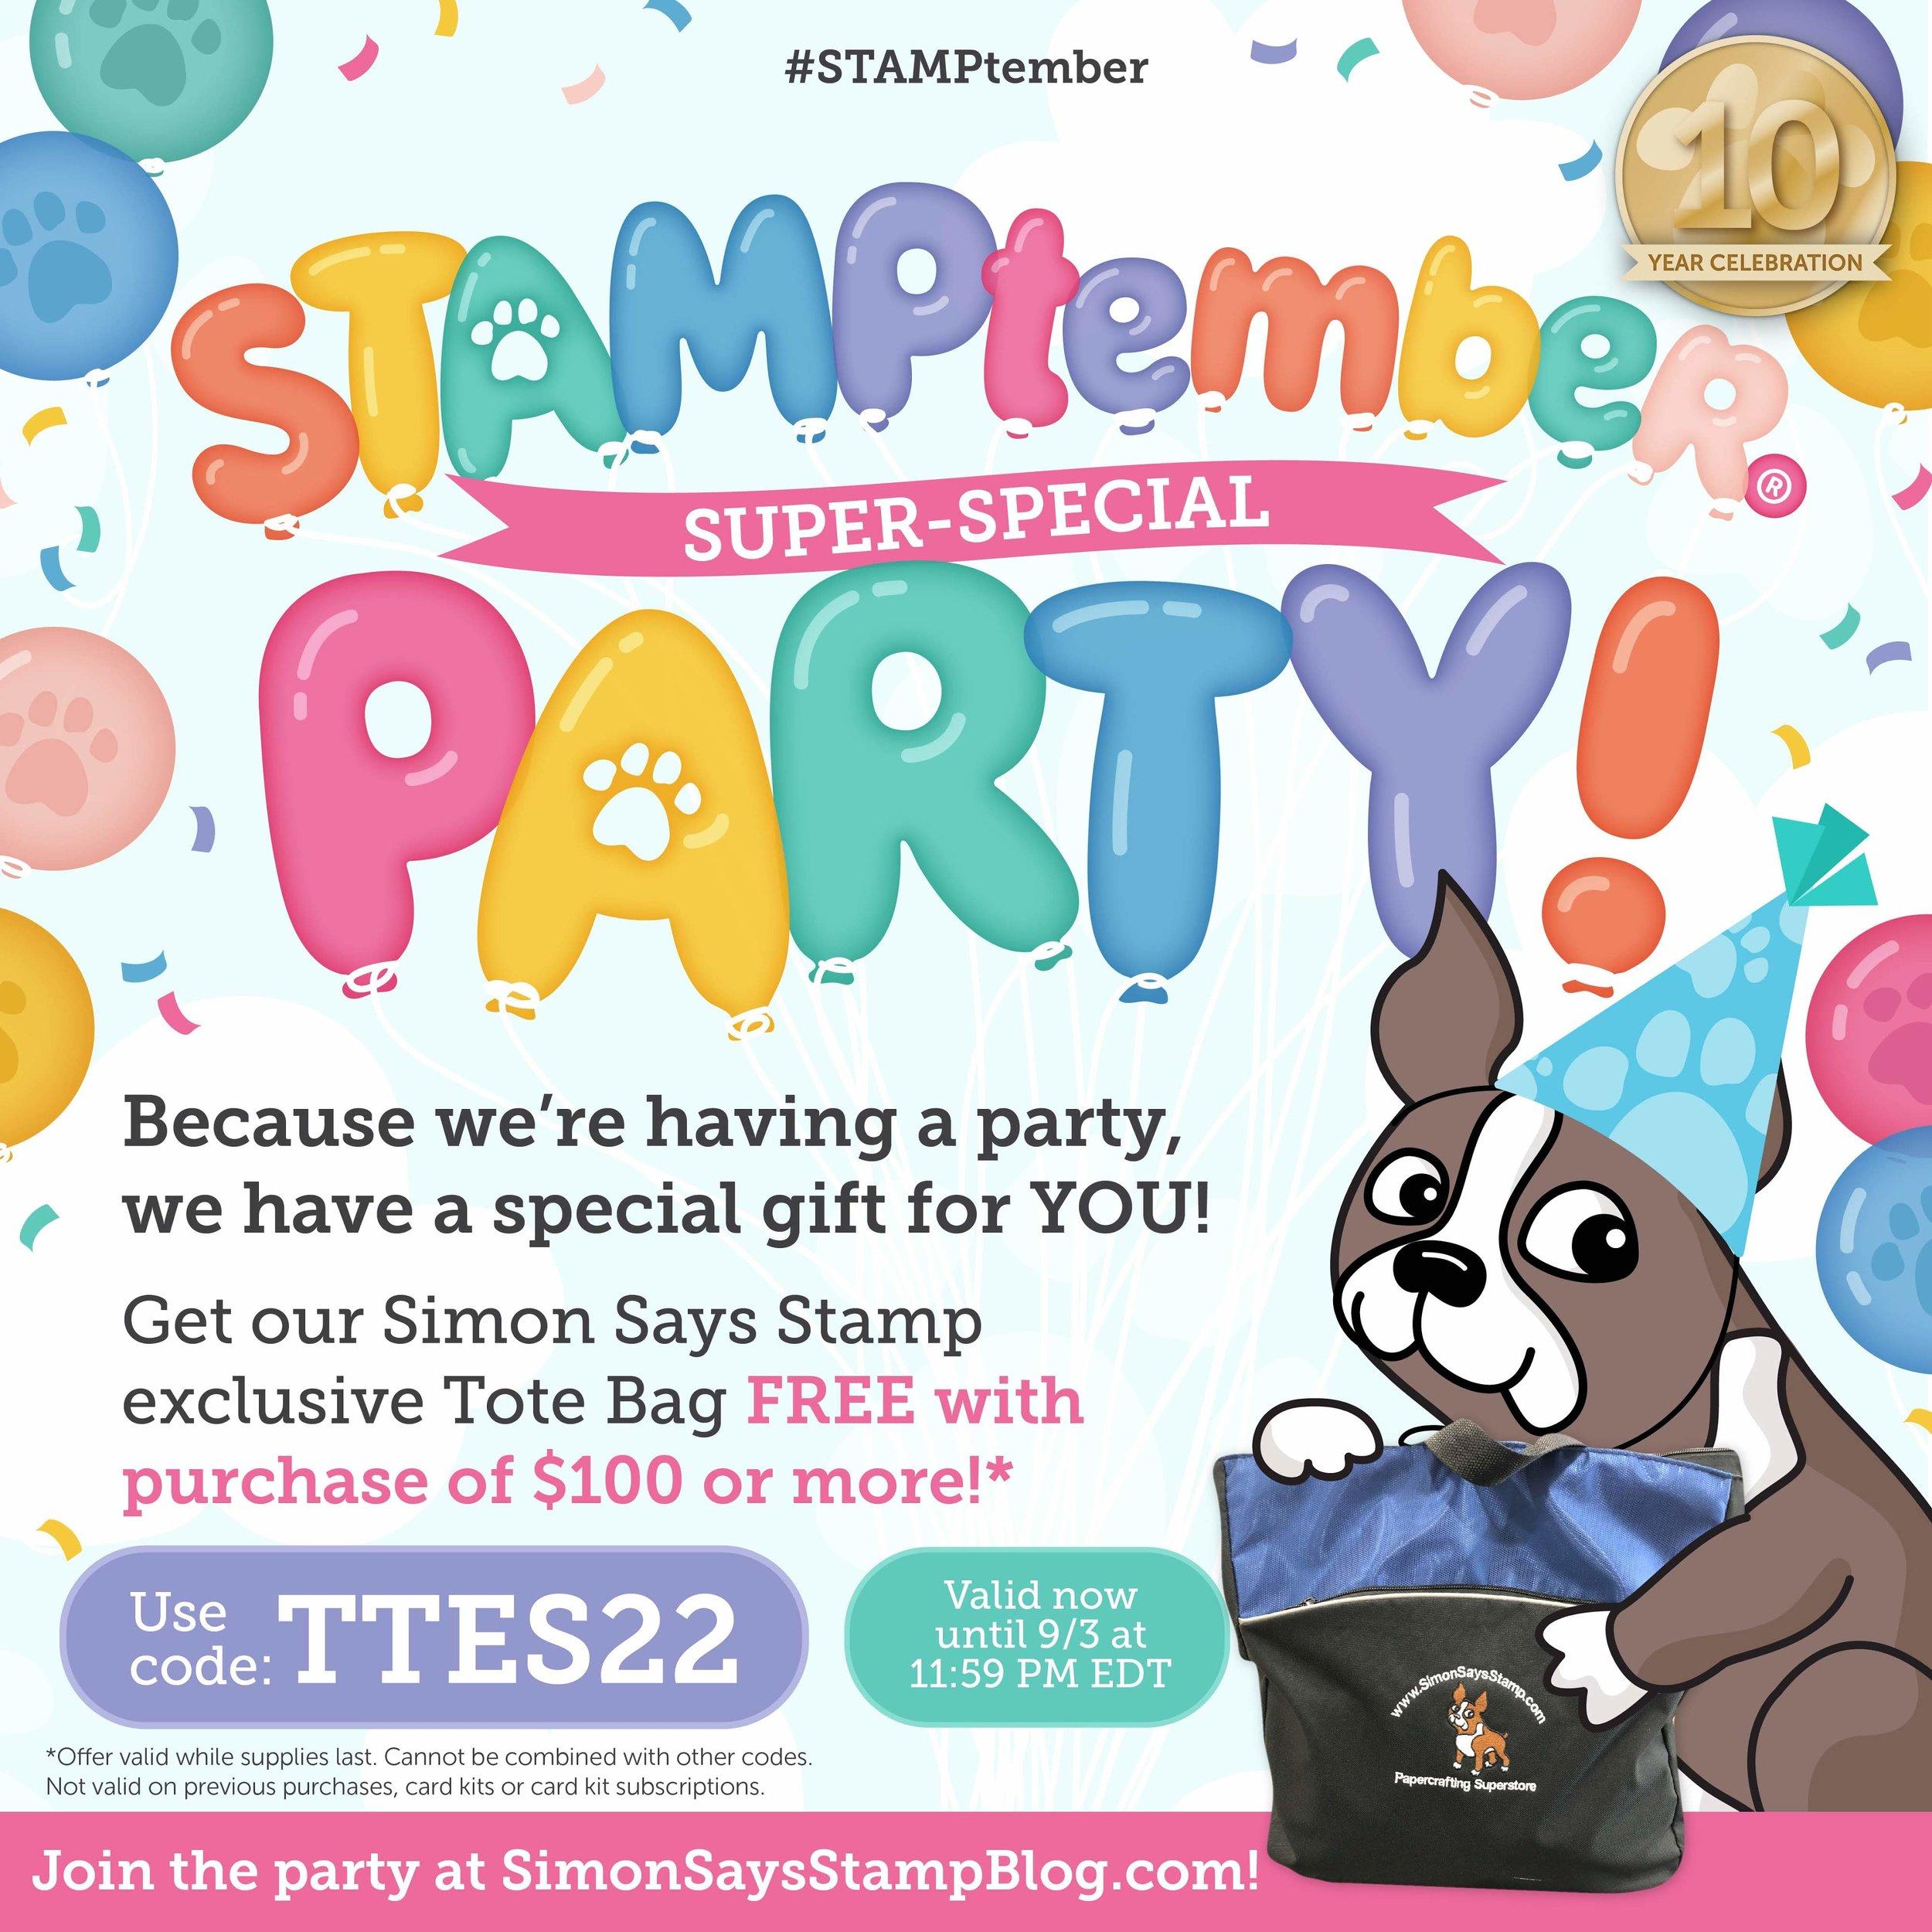 STAMPtember 2019 Free Gift_1080_Tote_TTES22-01 (1).jpg